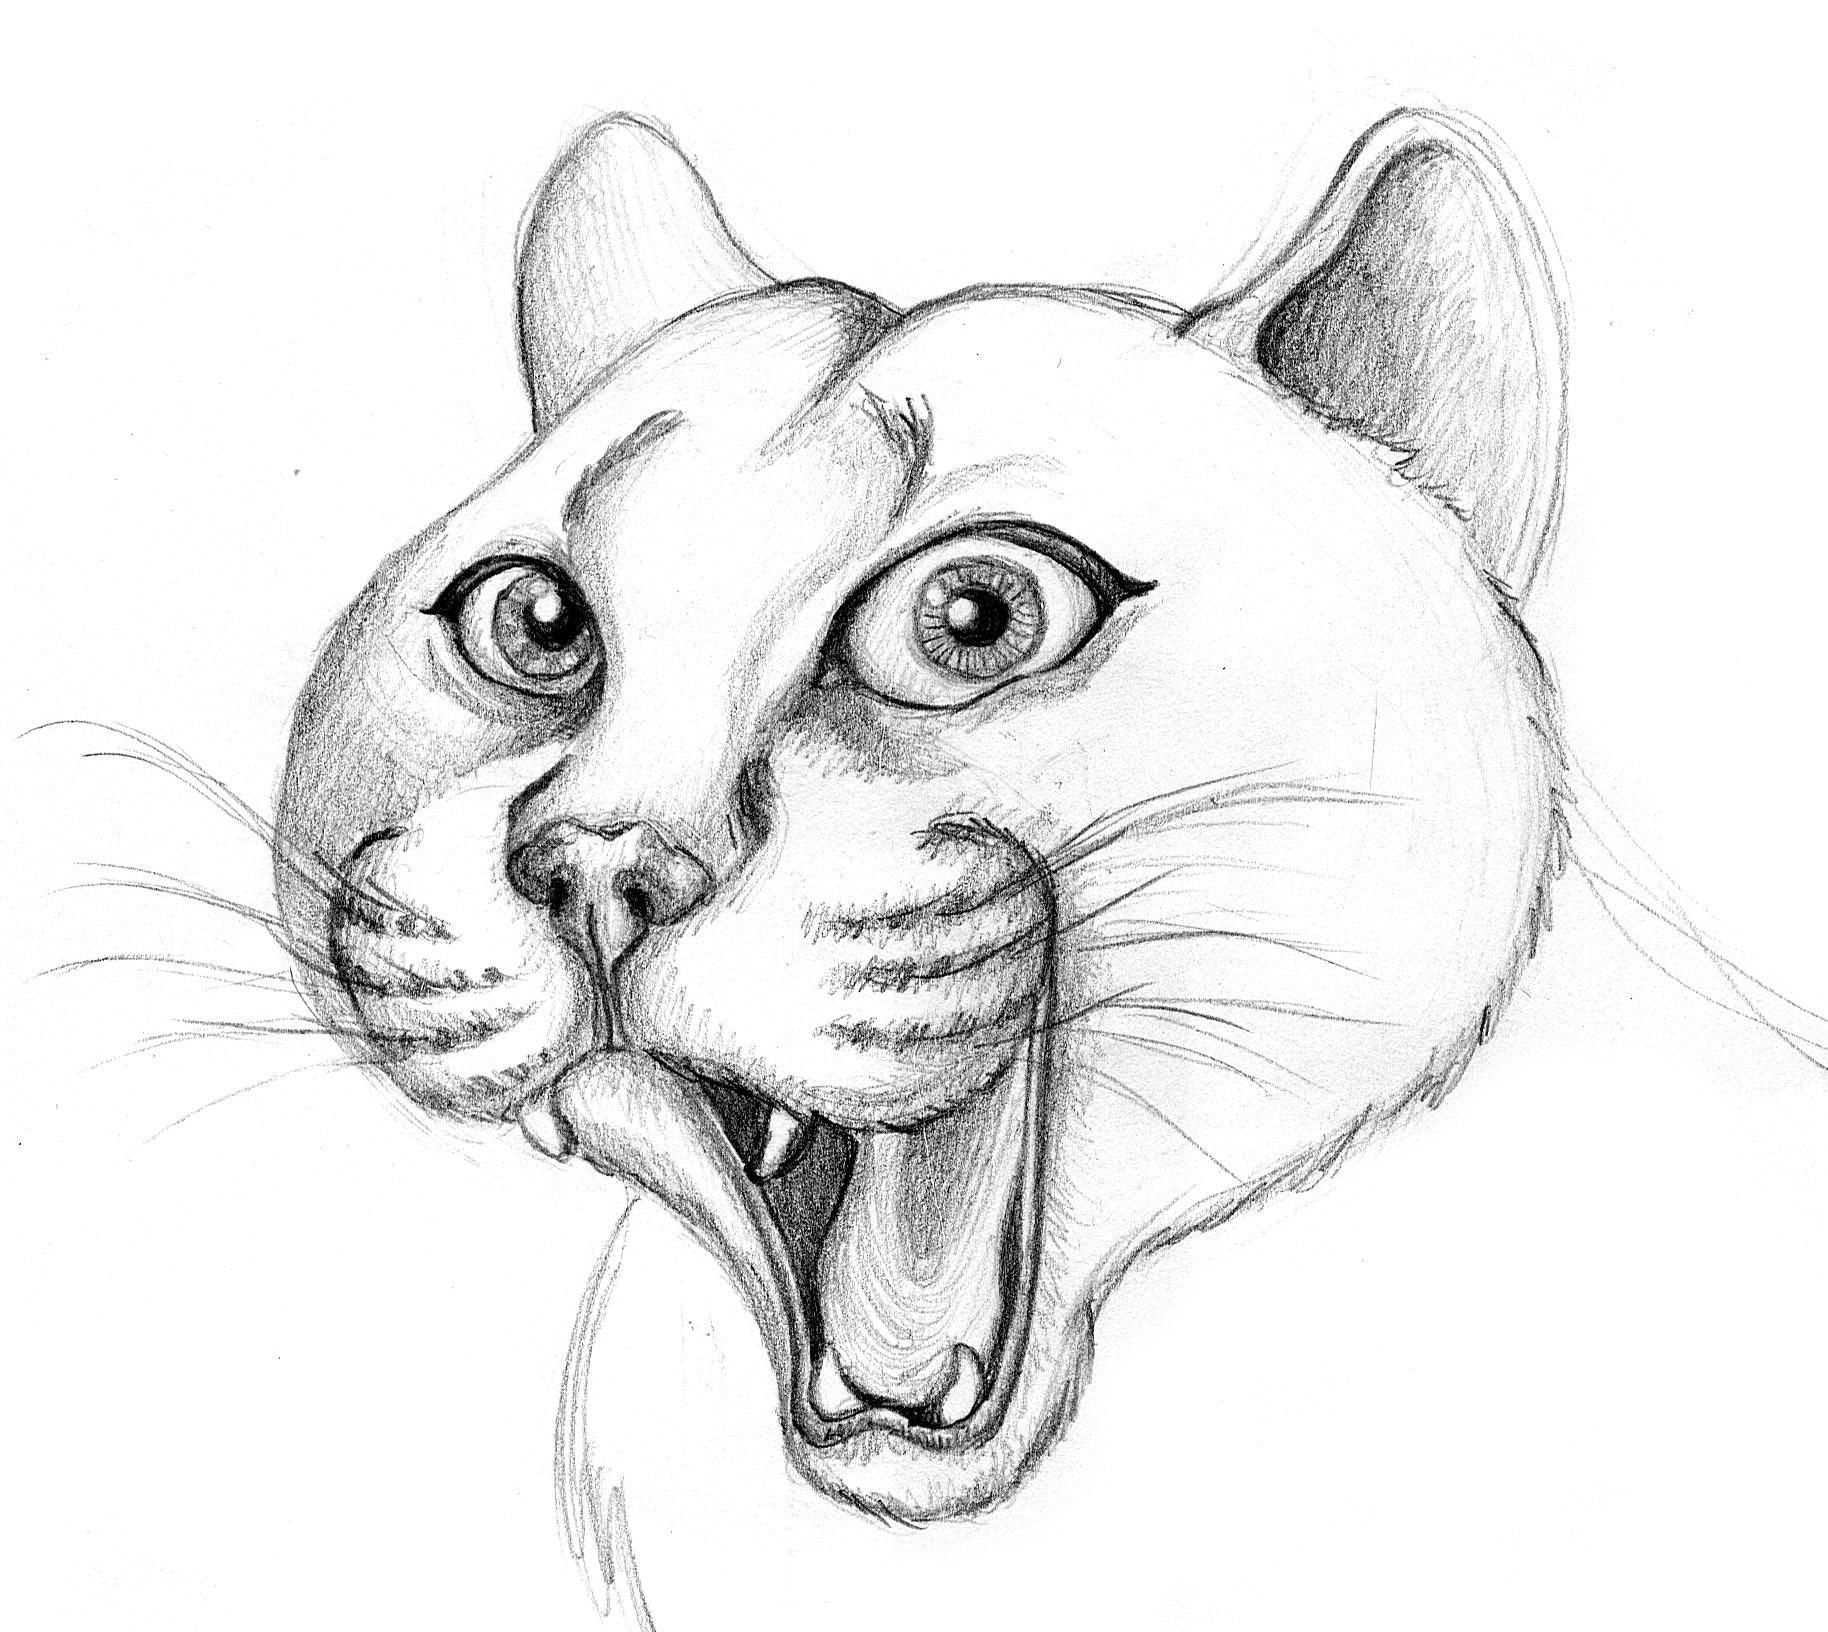 Patricia vasquez de velasco animales bocetos 02a